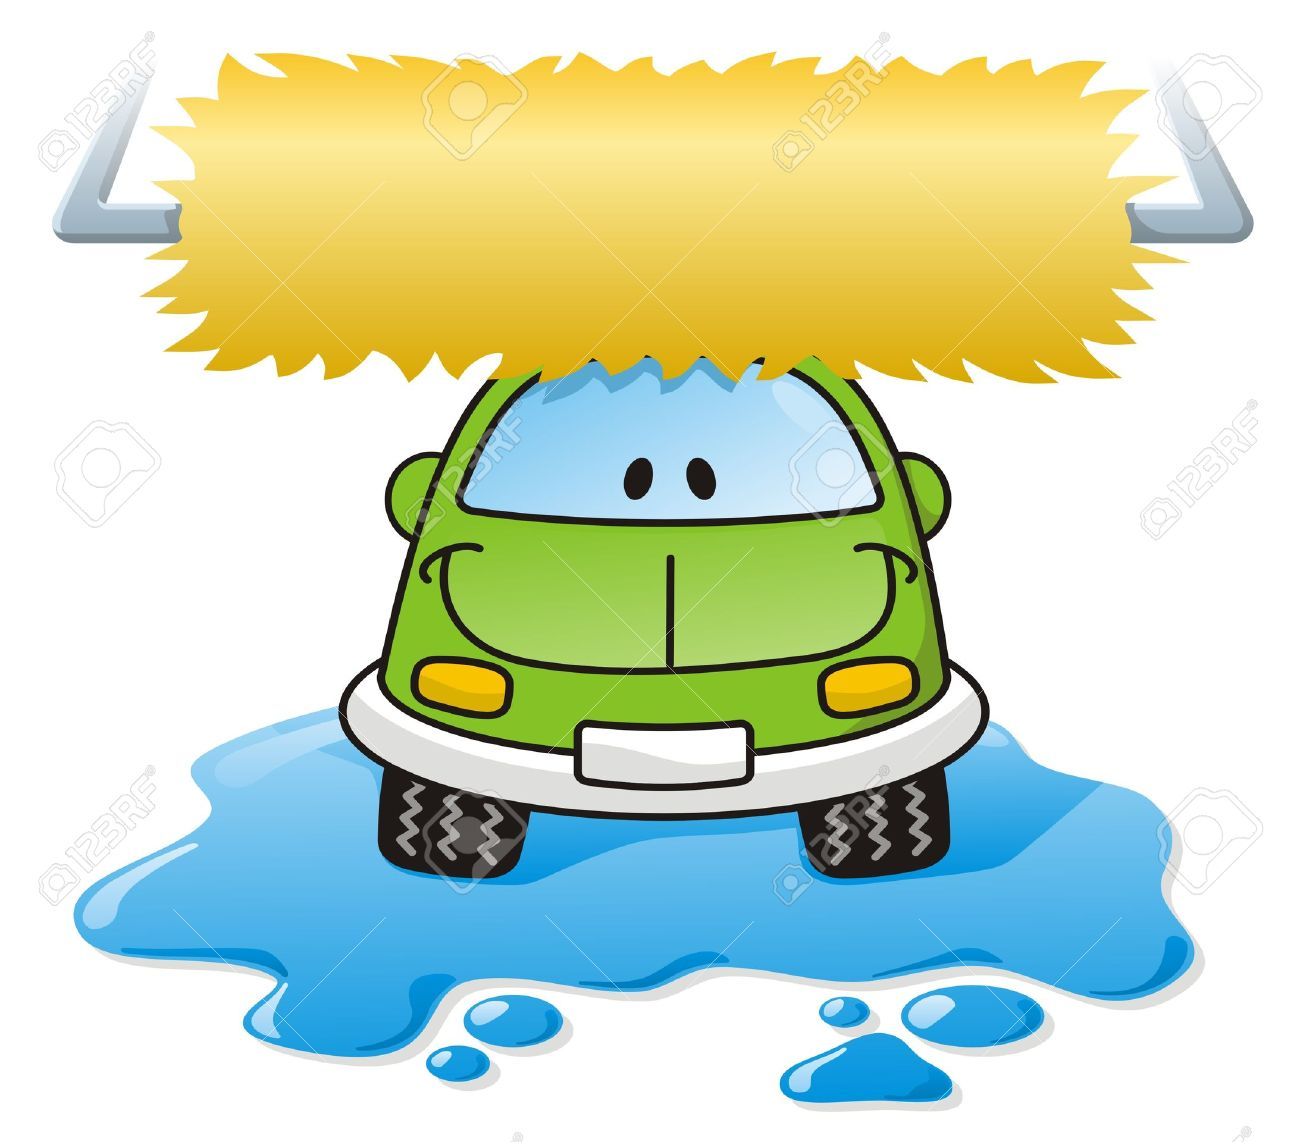 Cartoon Car Washing With Roller Brush And Water Splash Royalty.